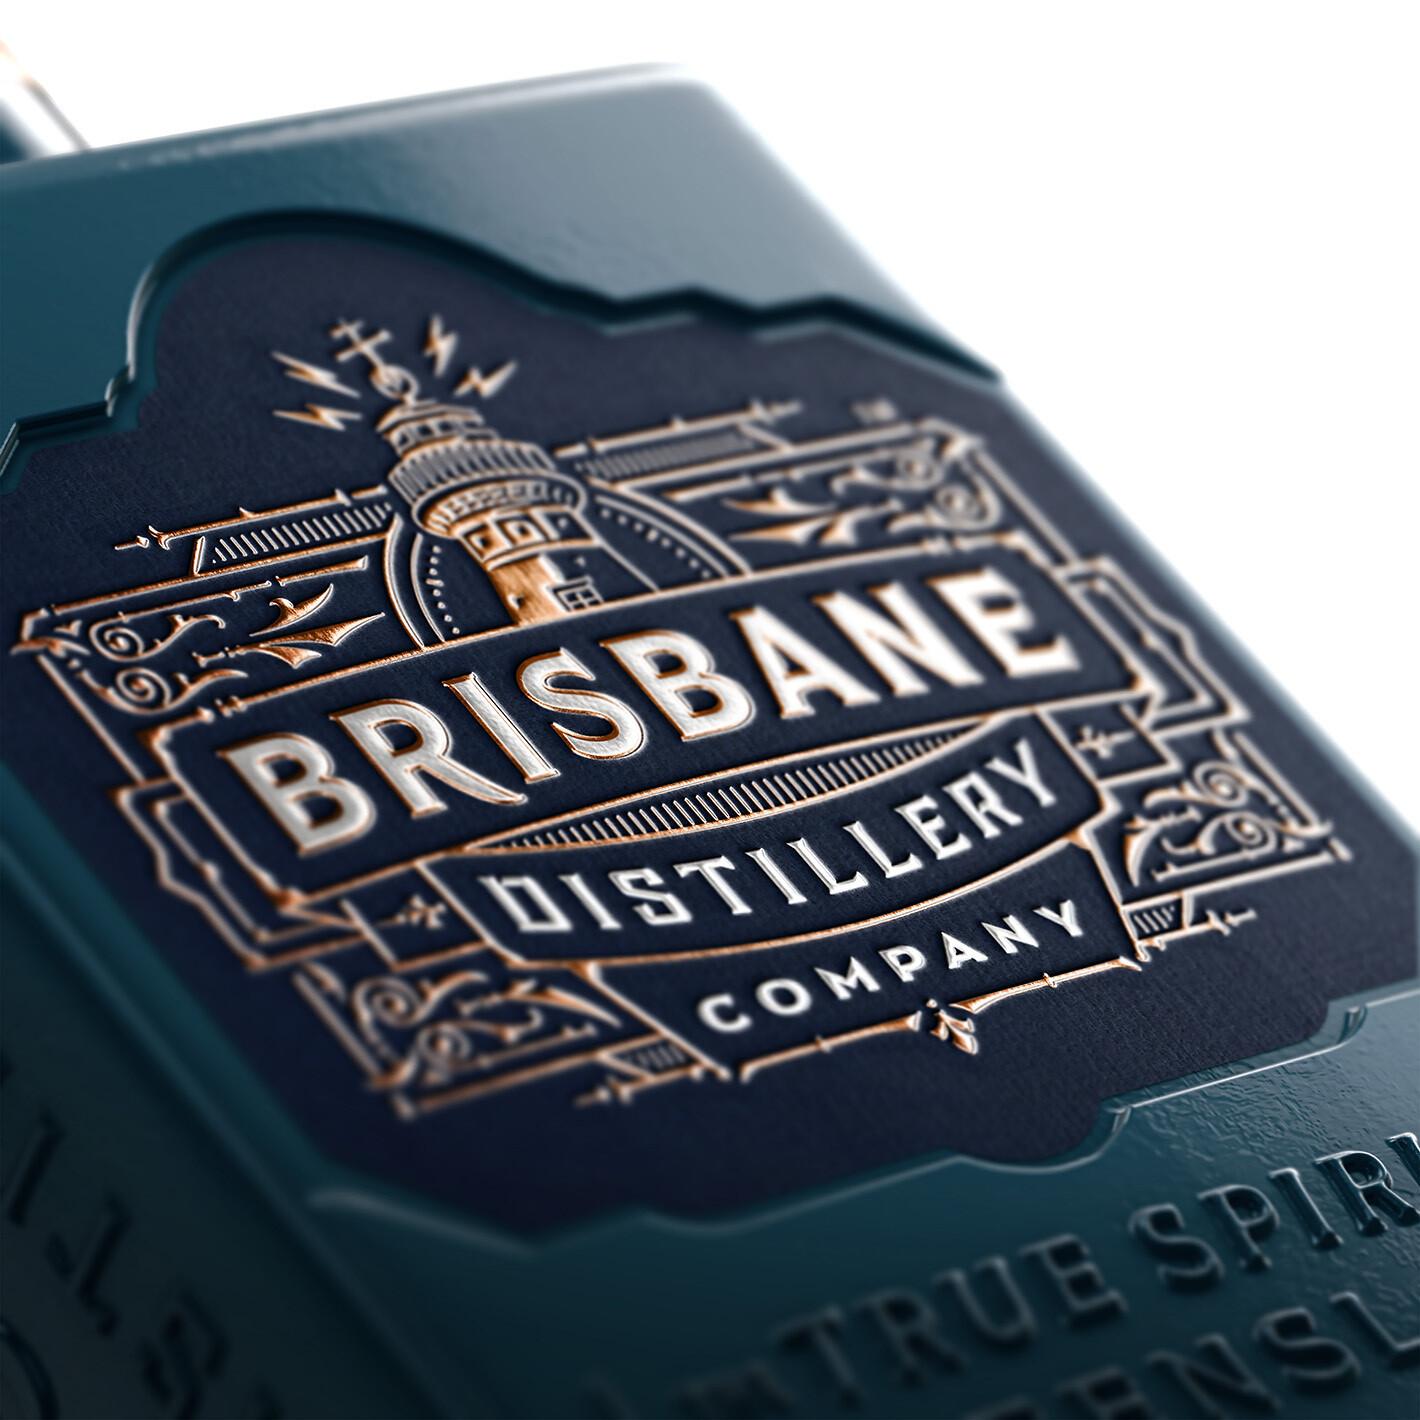 Brisbane Dry